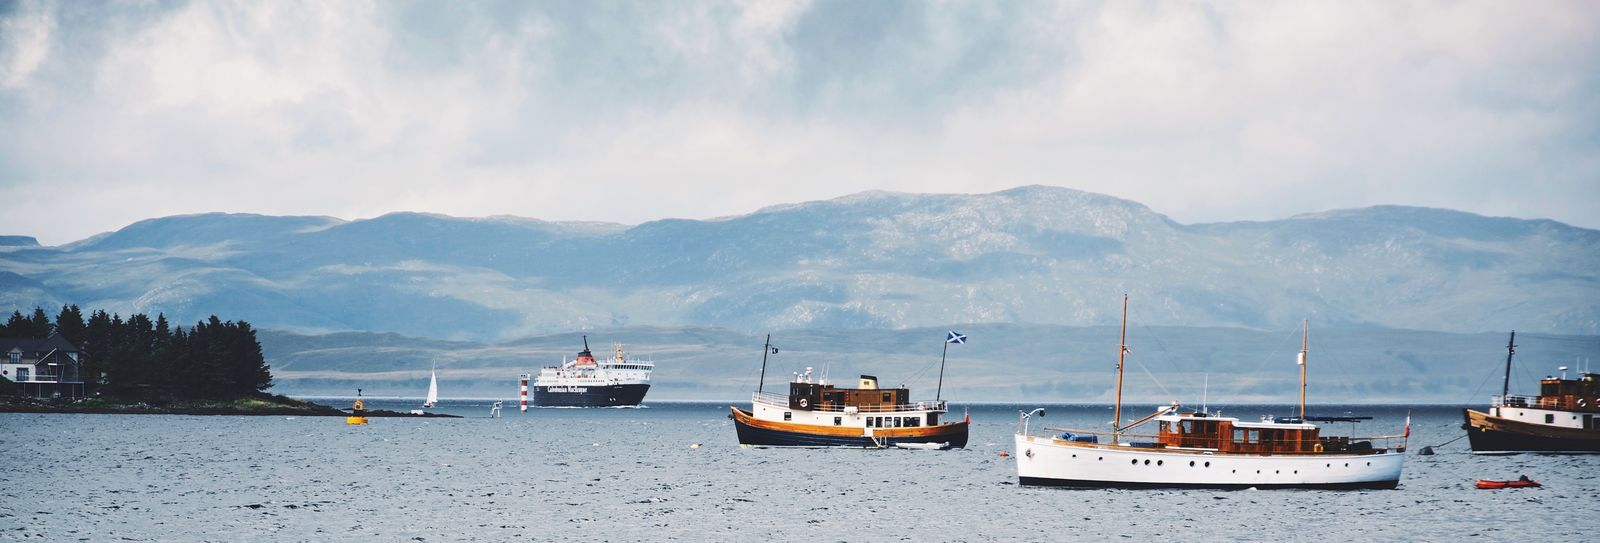 Oban   Seaside Seascape Landscape Landscape_Collection Landscape_photography Landscapes Vscocam VSCO Scotland Eyeem Scotland